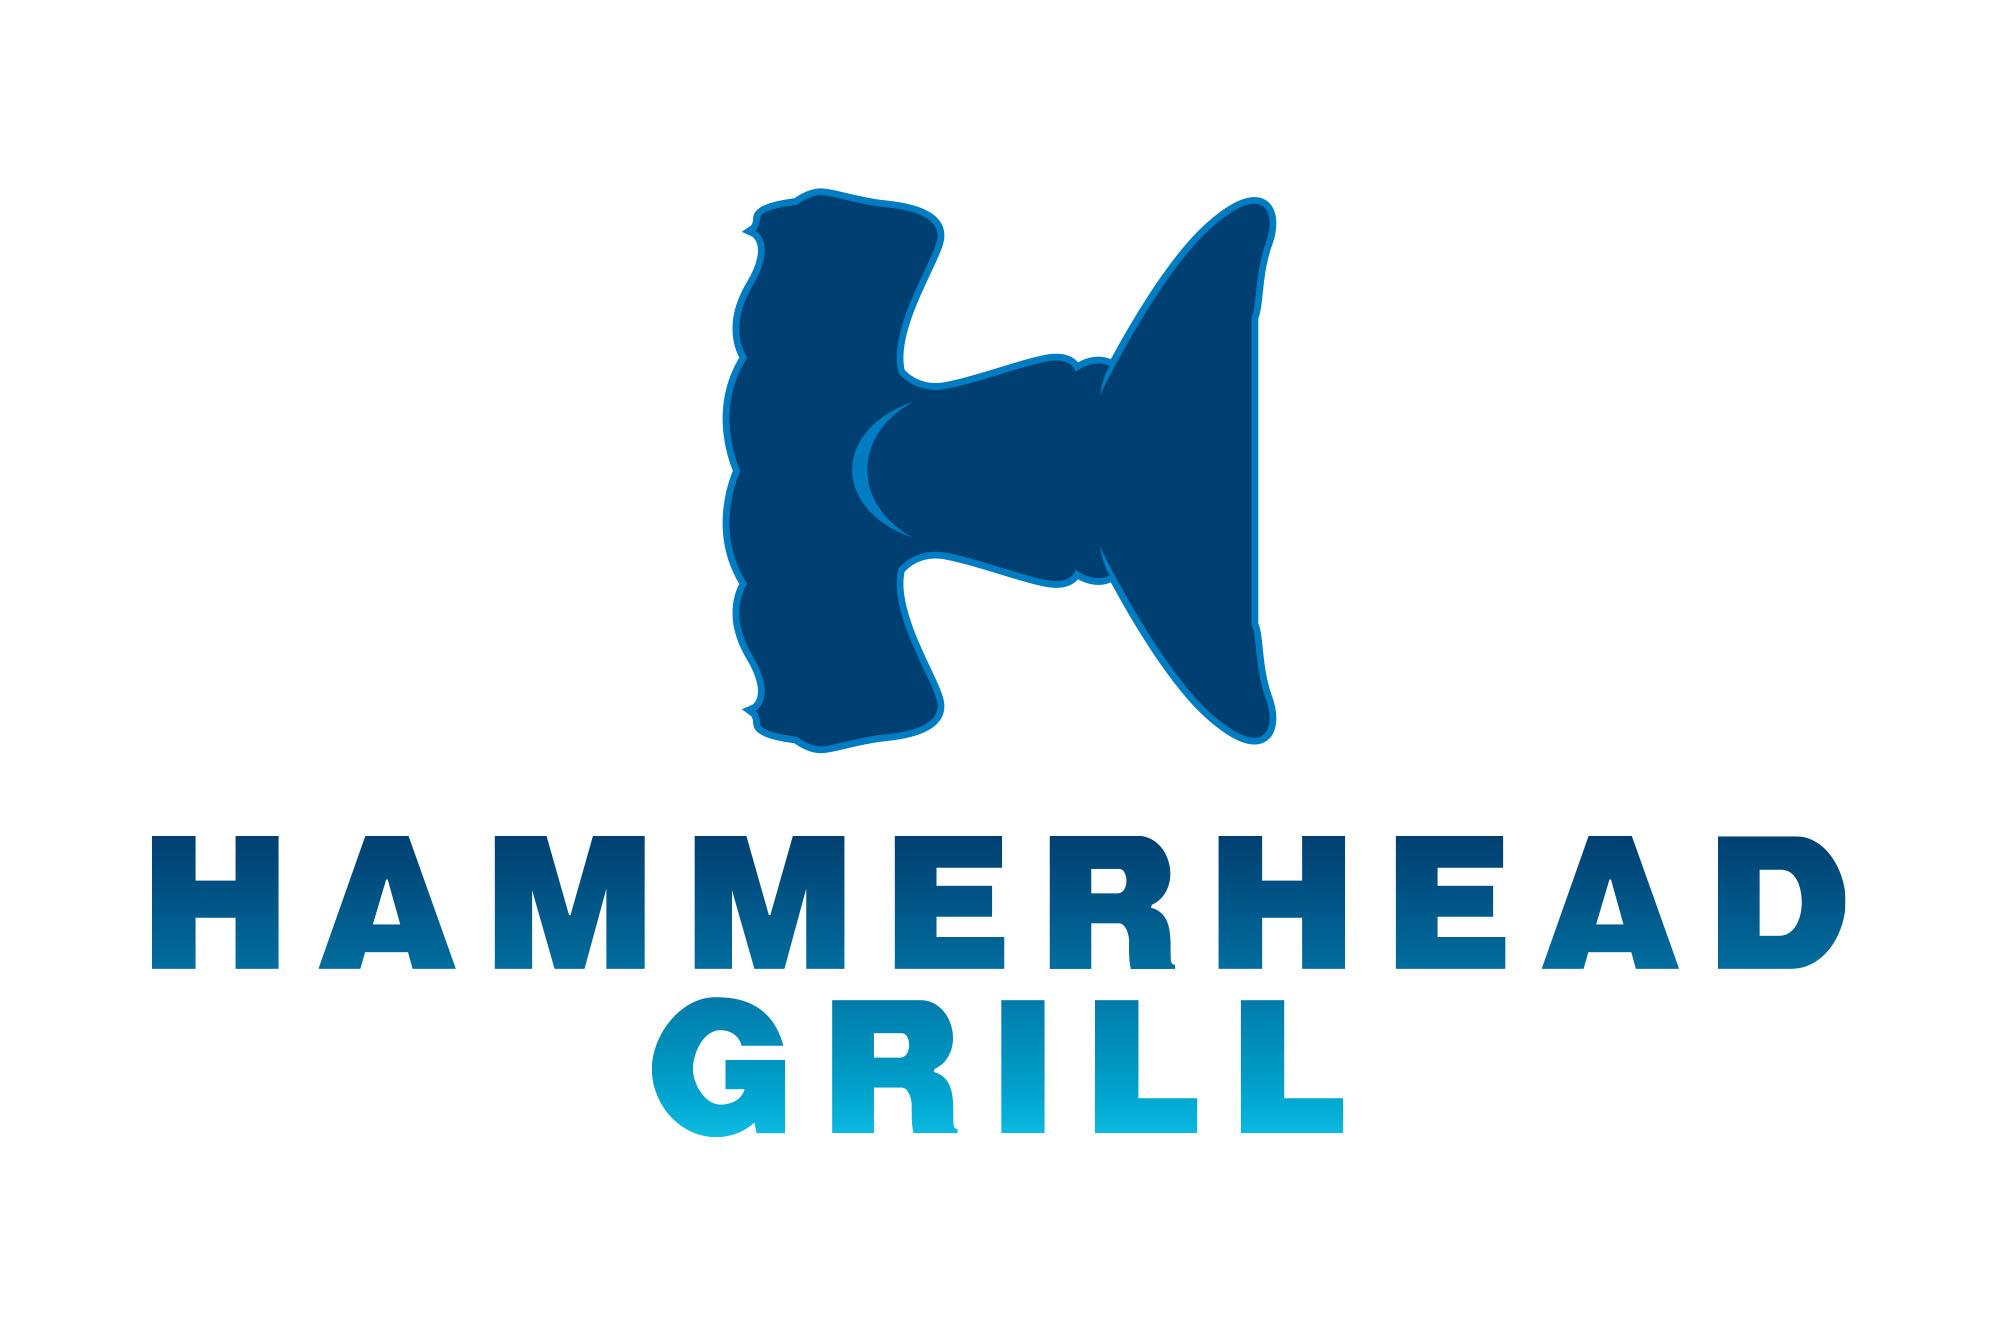 Hammerhead grill logo.jpg